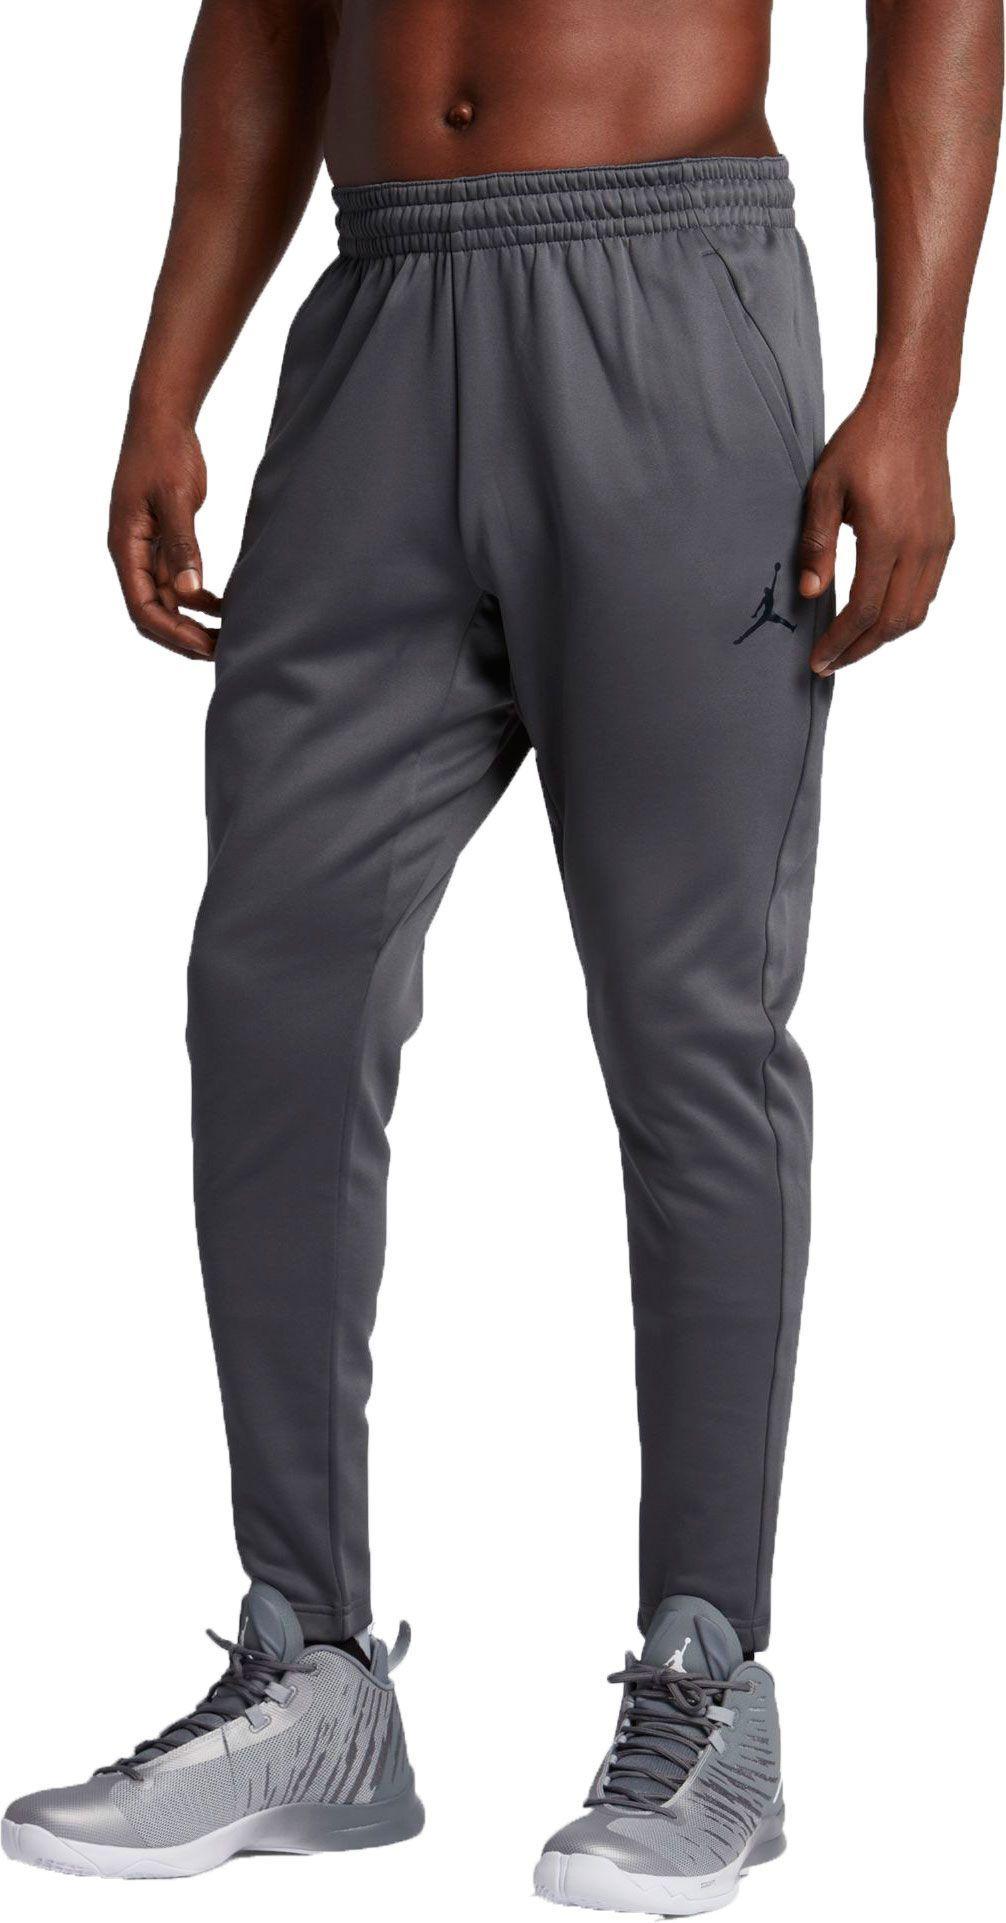 c7d1acc9abb2c3 Jordan Men s Therma 23 Protect Alpha Pants